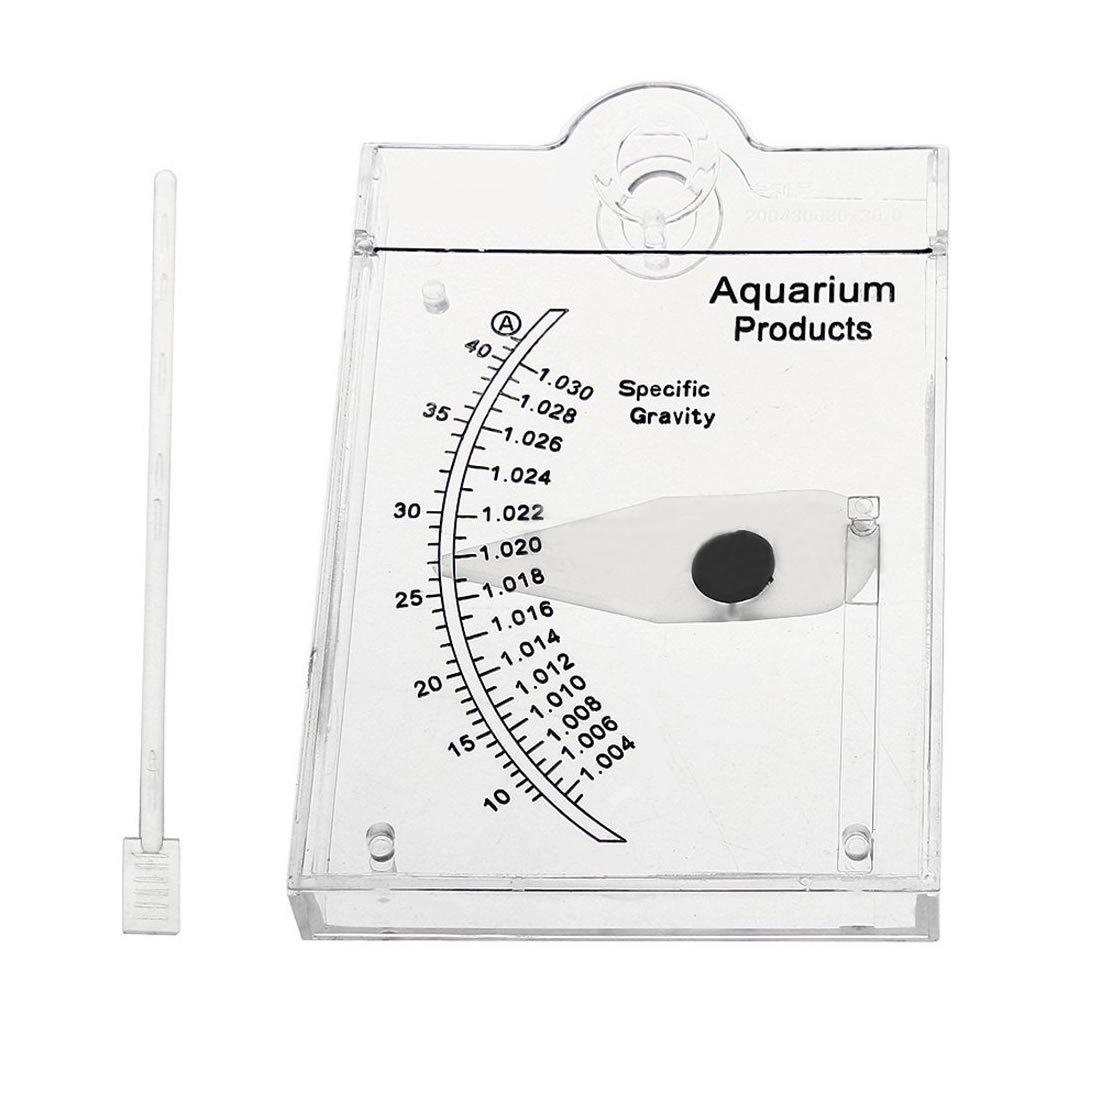 pranovo Sea Hydrometer Salinity Meter Specific Gravity Test for Aquarium Fish Tank Water Marine Sea Saltwater